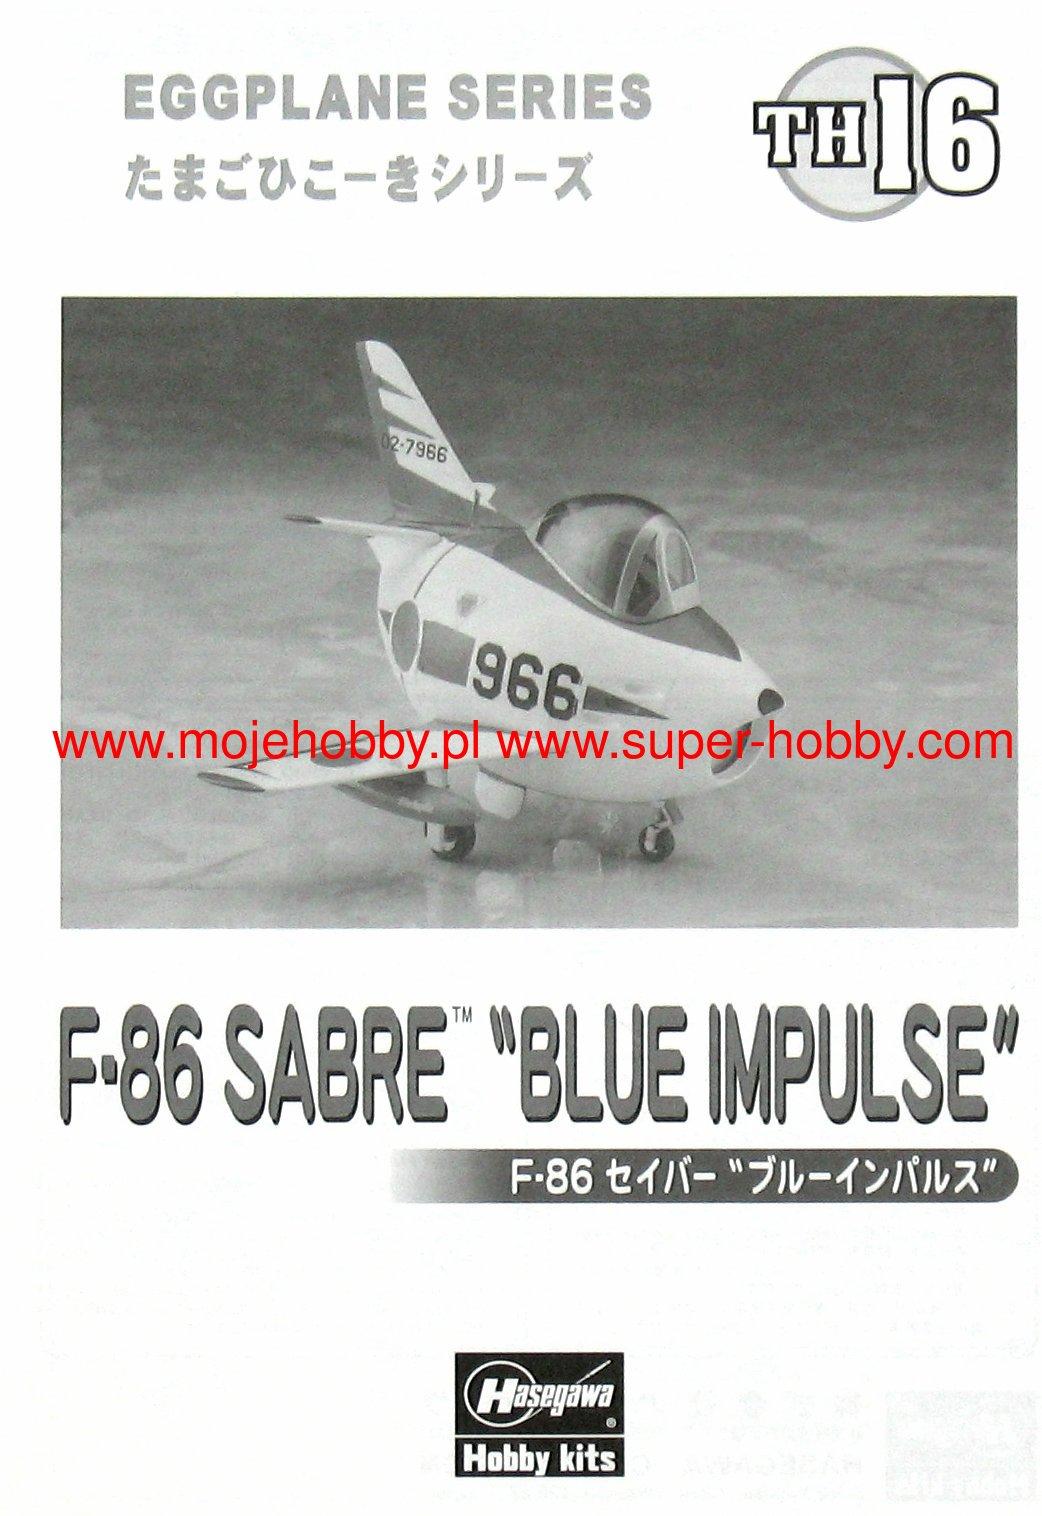 Egg Plane Series Hasegawa TH16 F-86 SABRE Eggplane